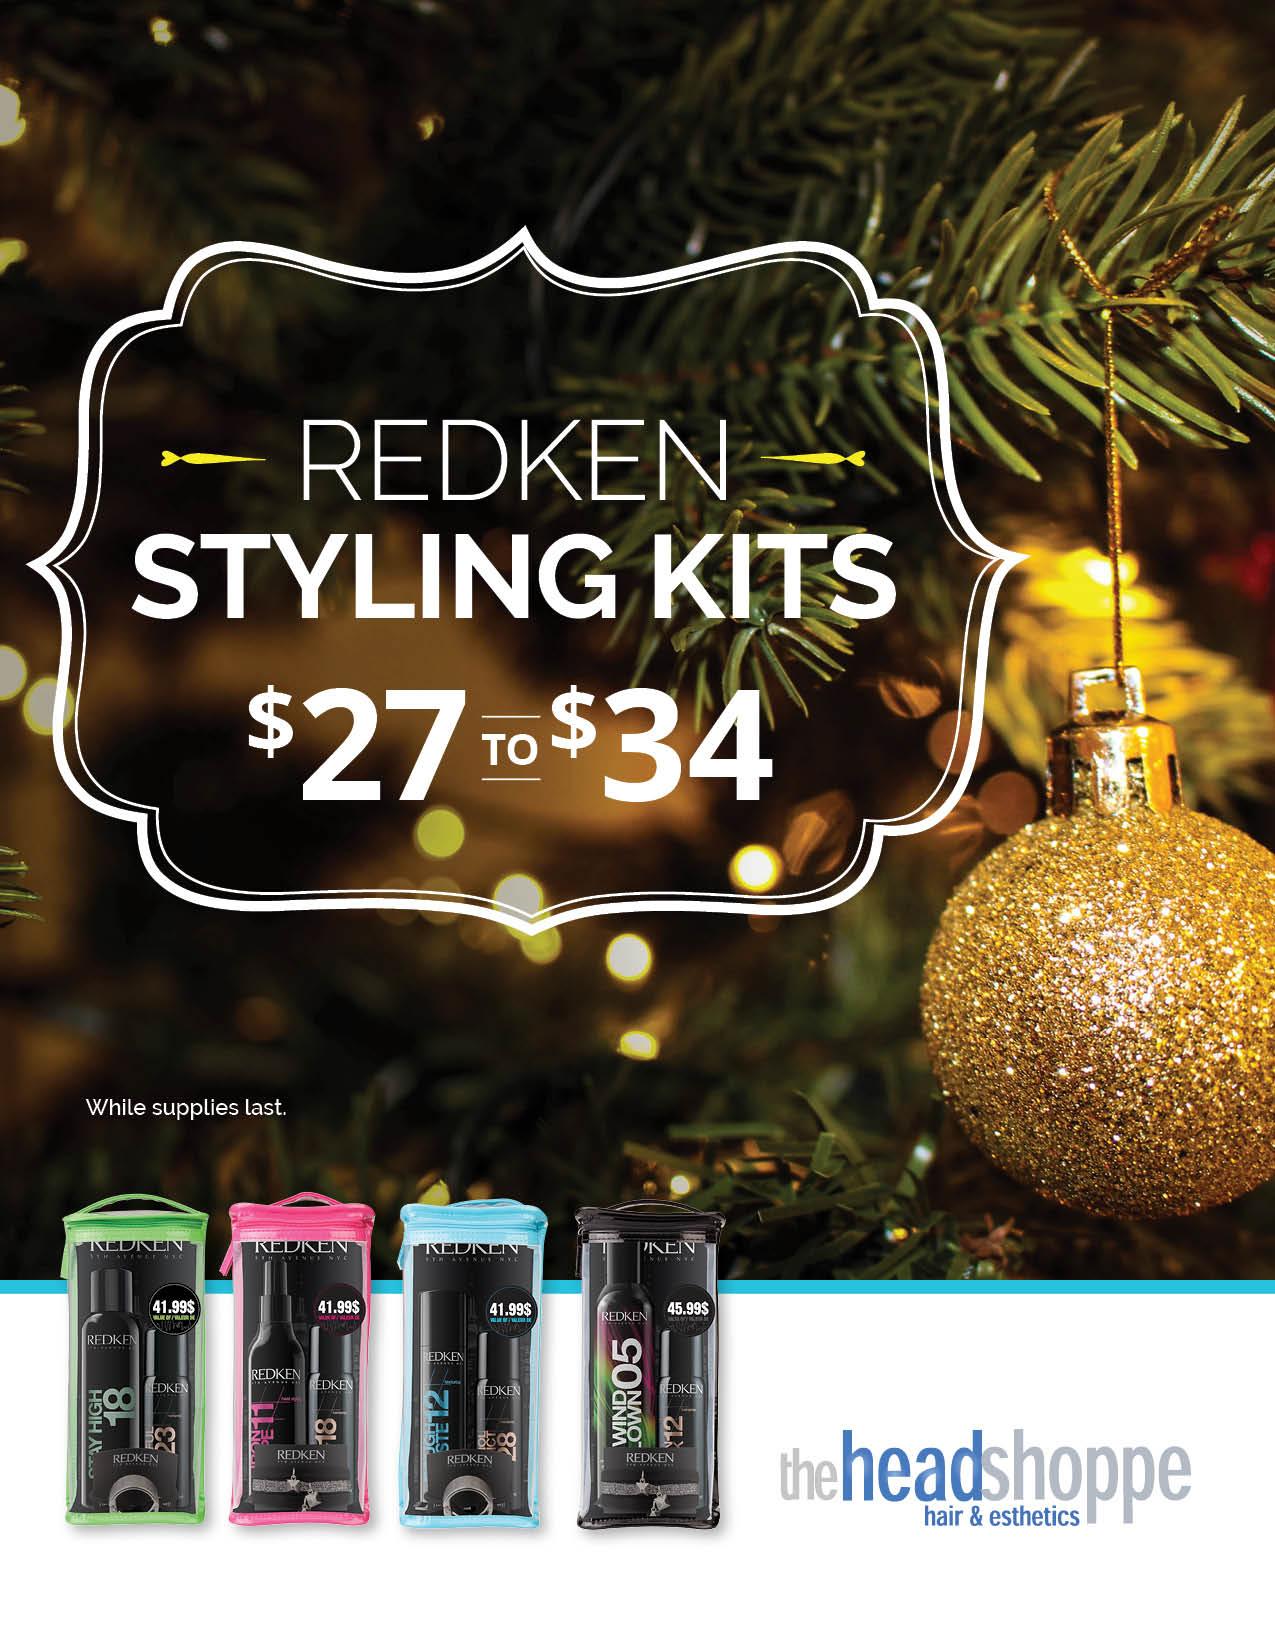 Redken Styling Kits